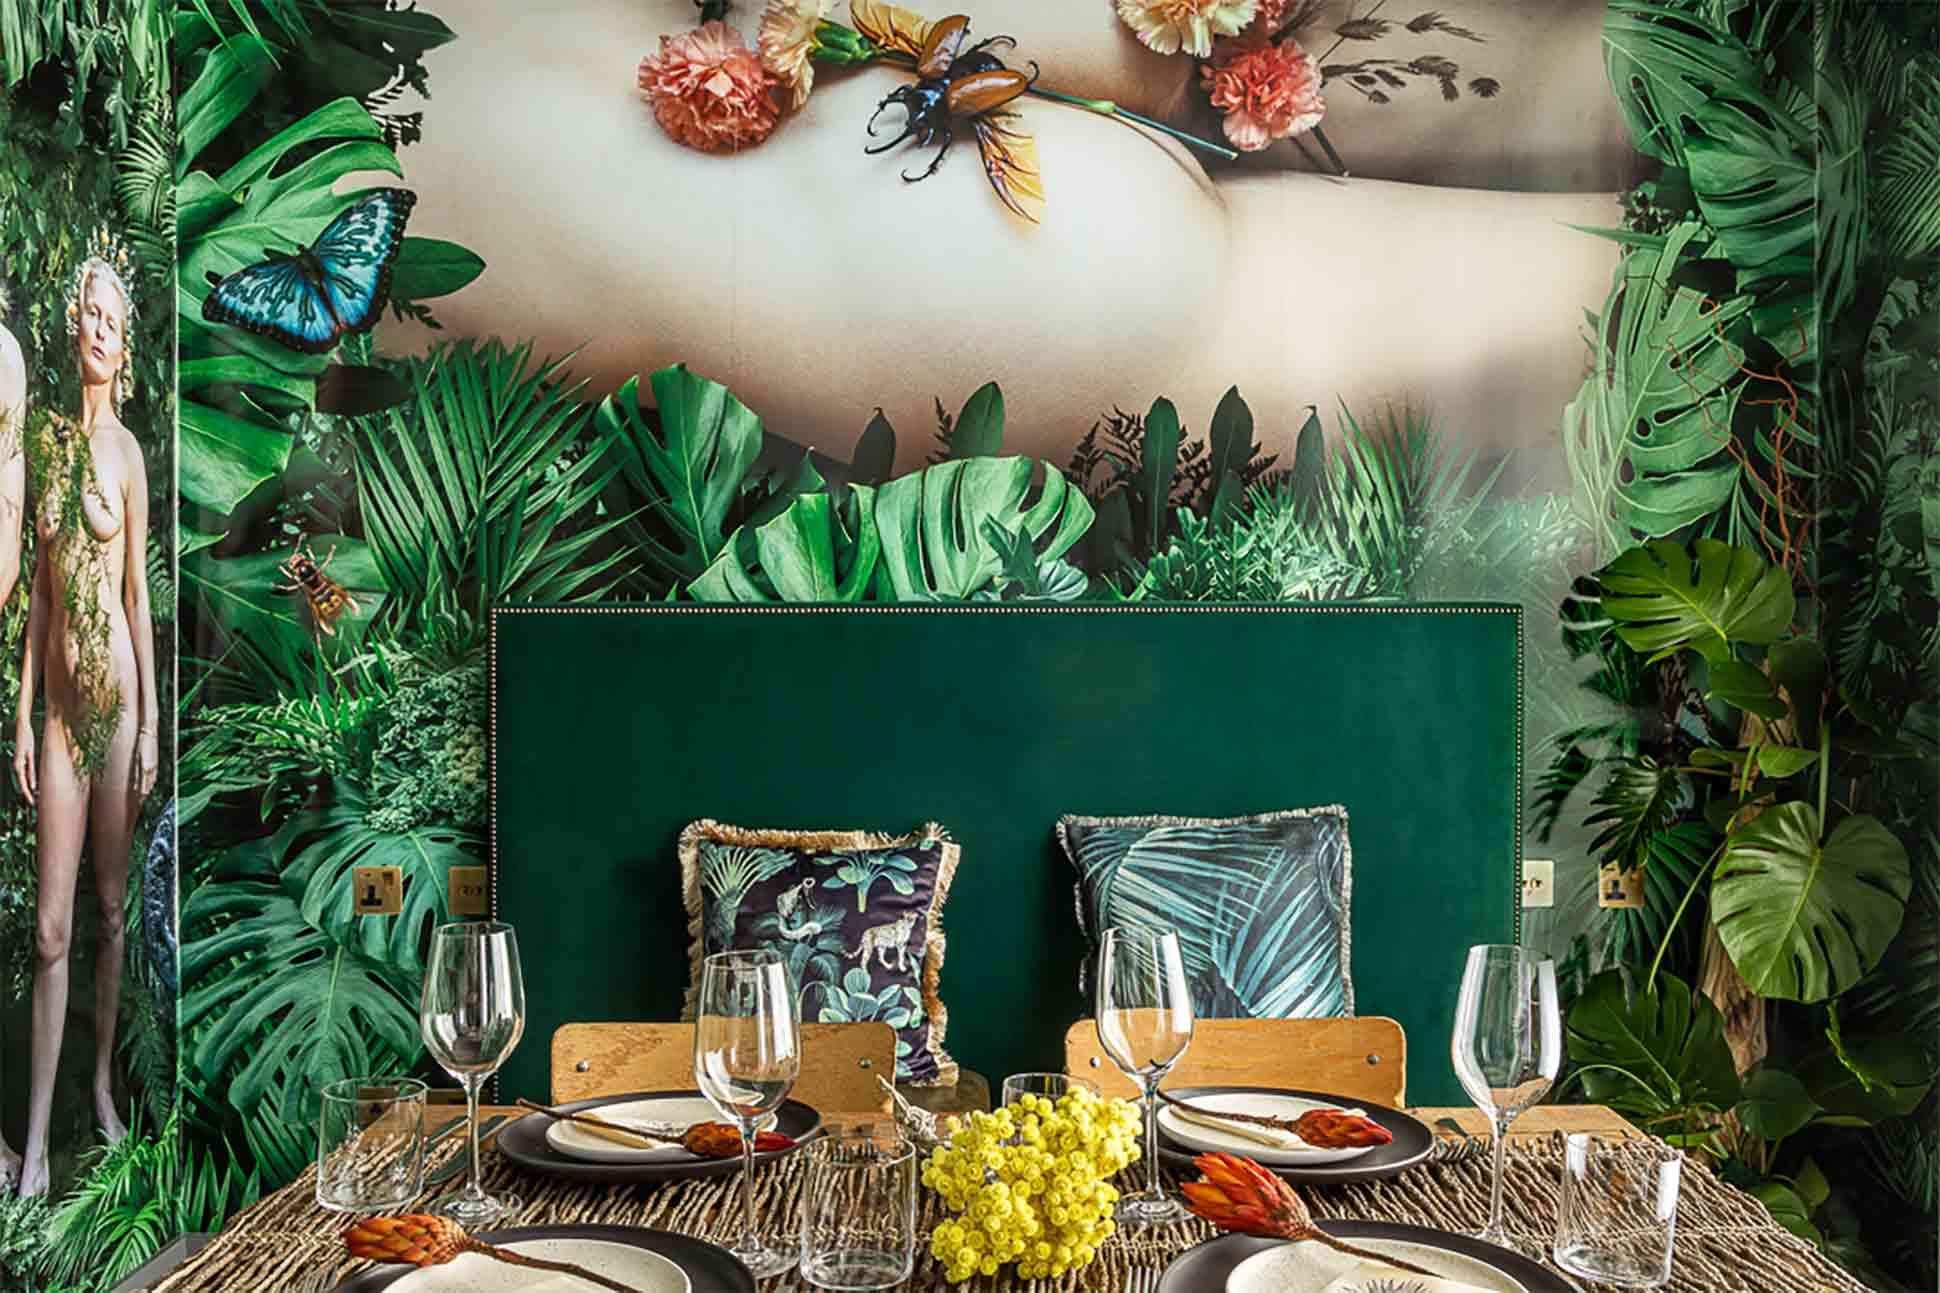 The Mandrake artist cabanas, London, UK